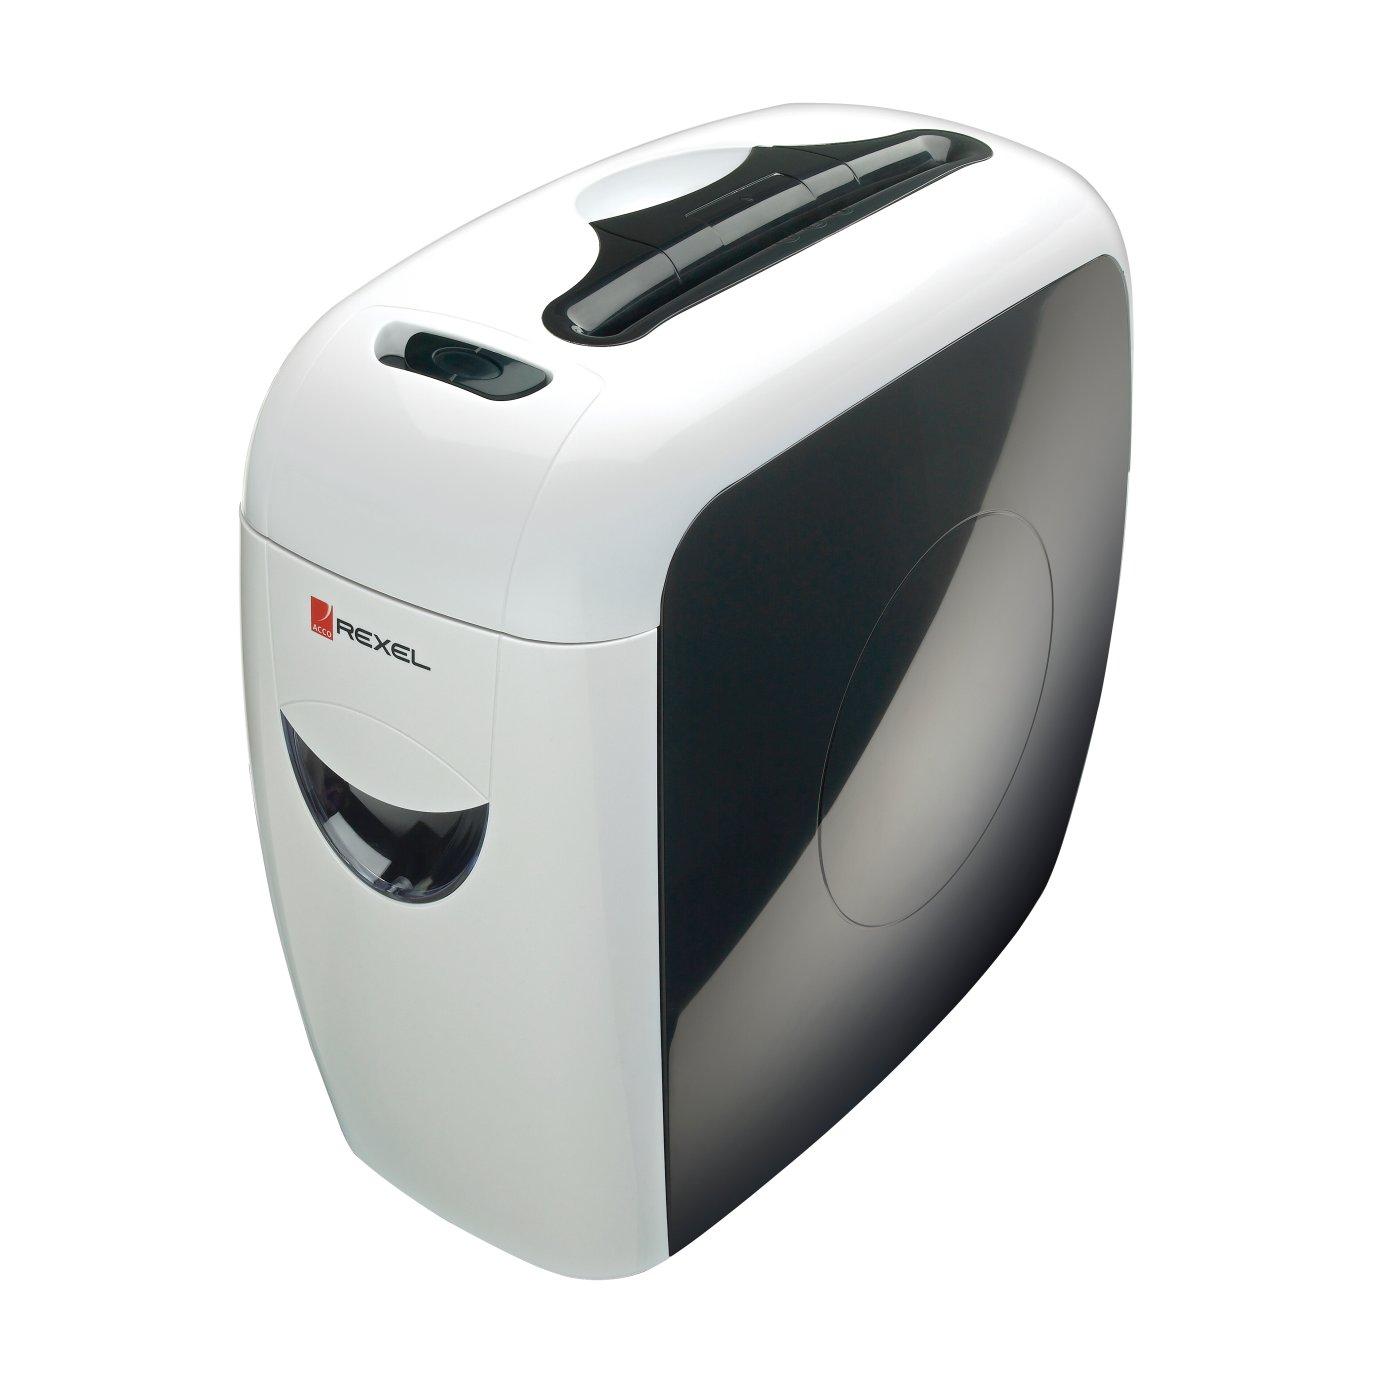 Personal paper shredder reviews